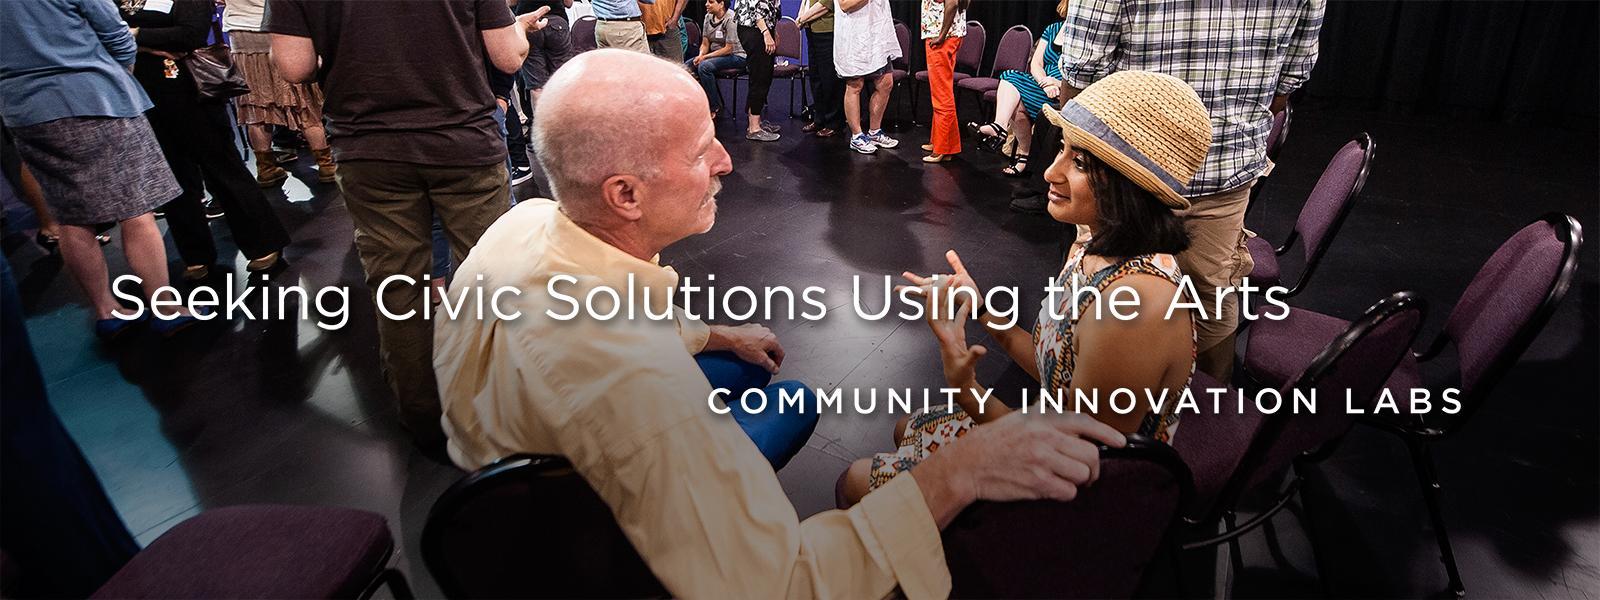 Community Innovation Labs